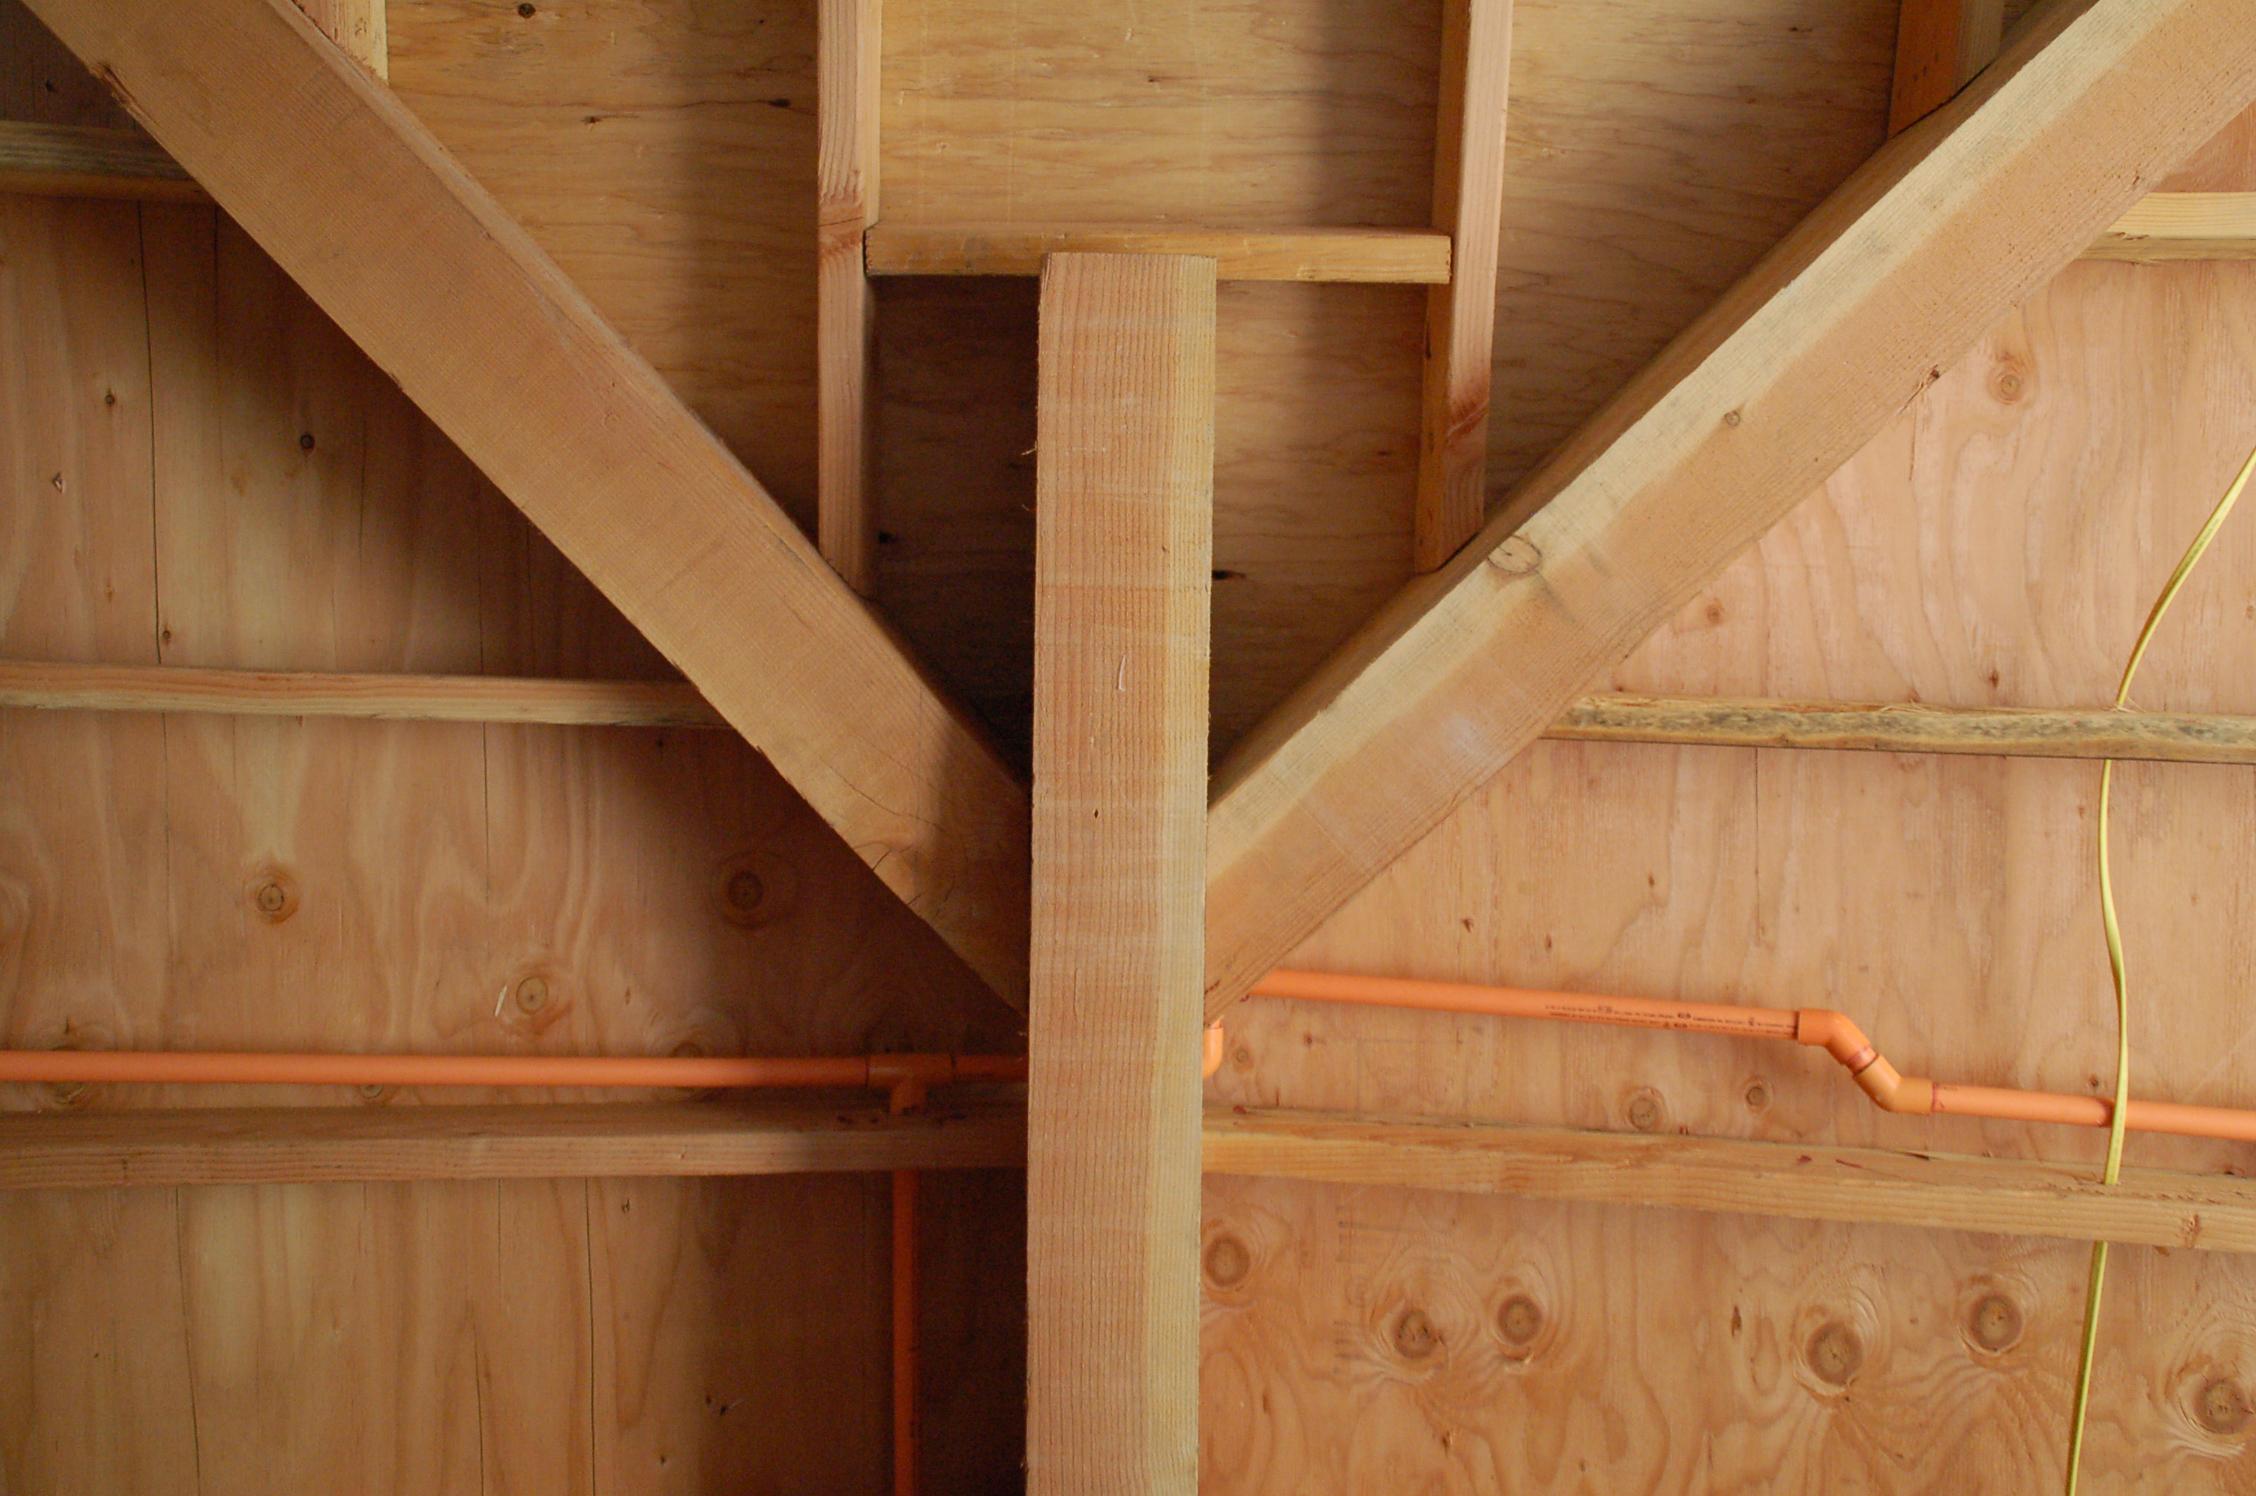 Ceiling/roof framing.